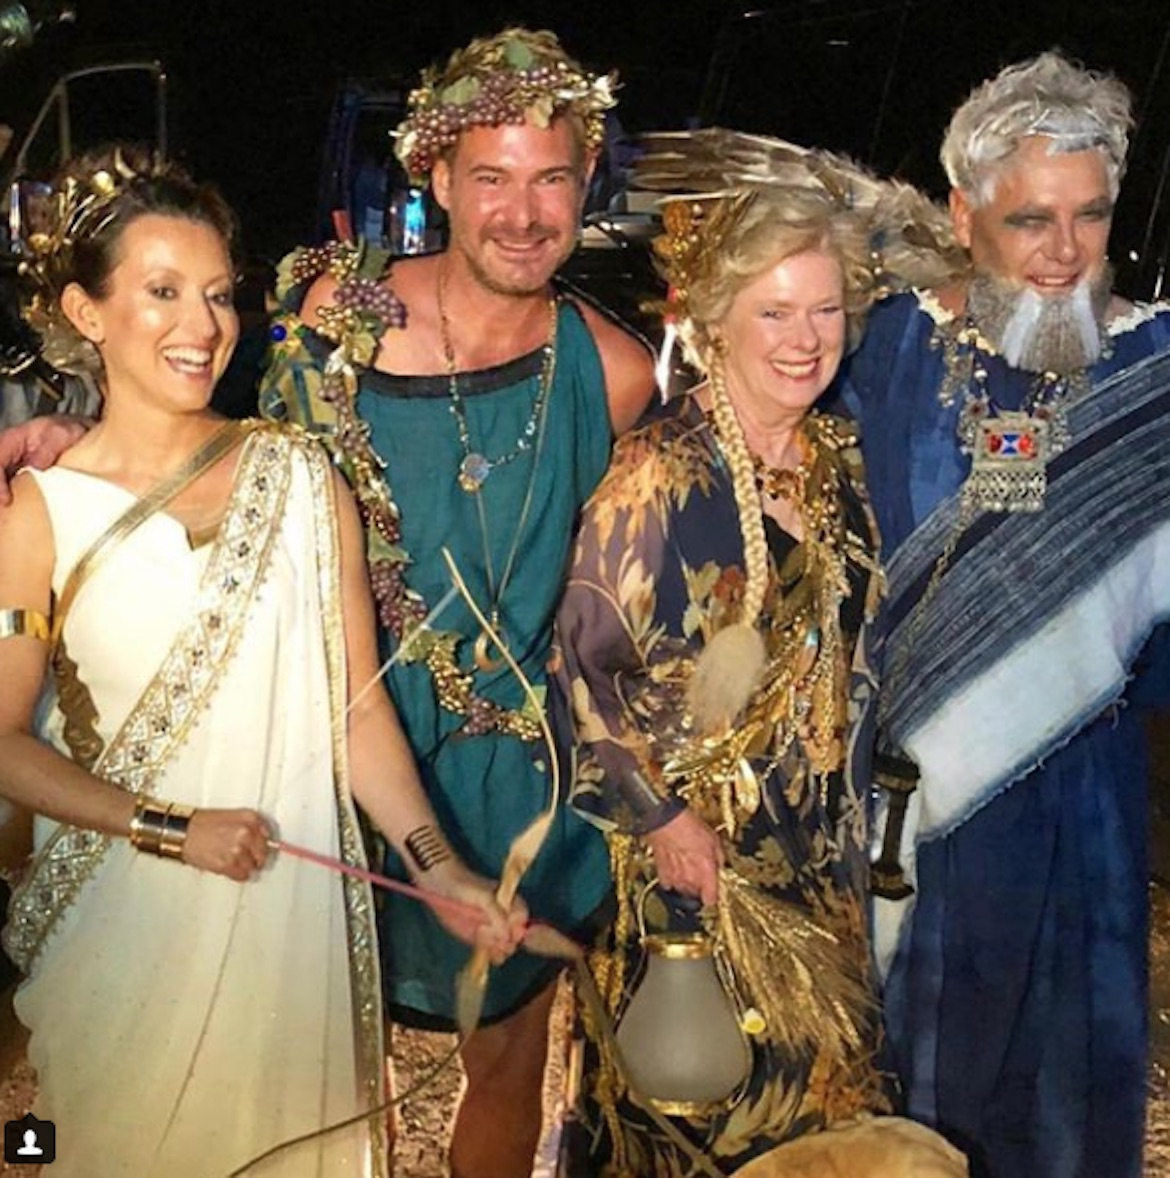 (Photos) NYC's Elite Celebrate Homeric Inspired Birthday Bash on Mykonos